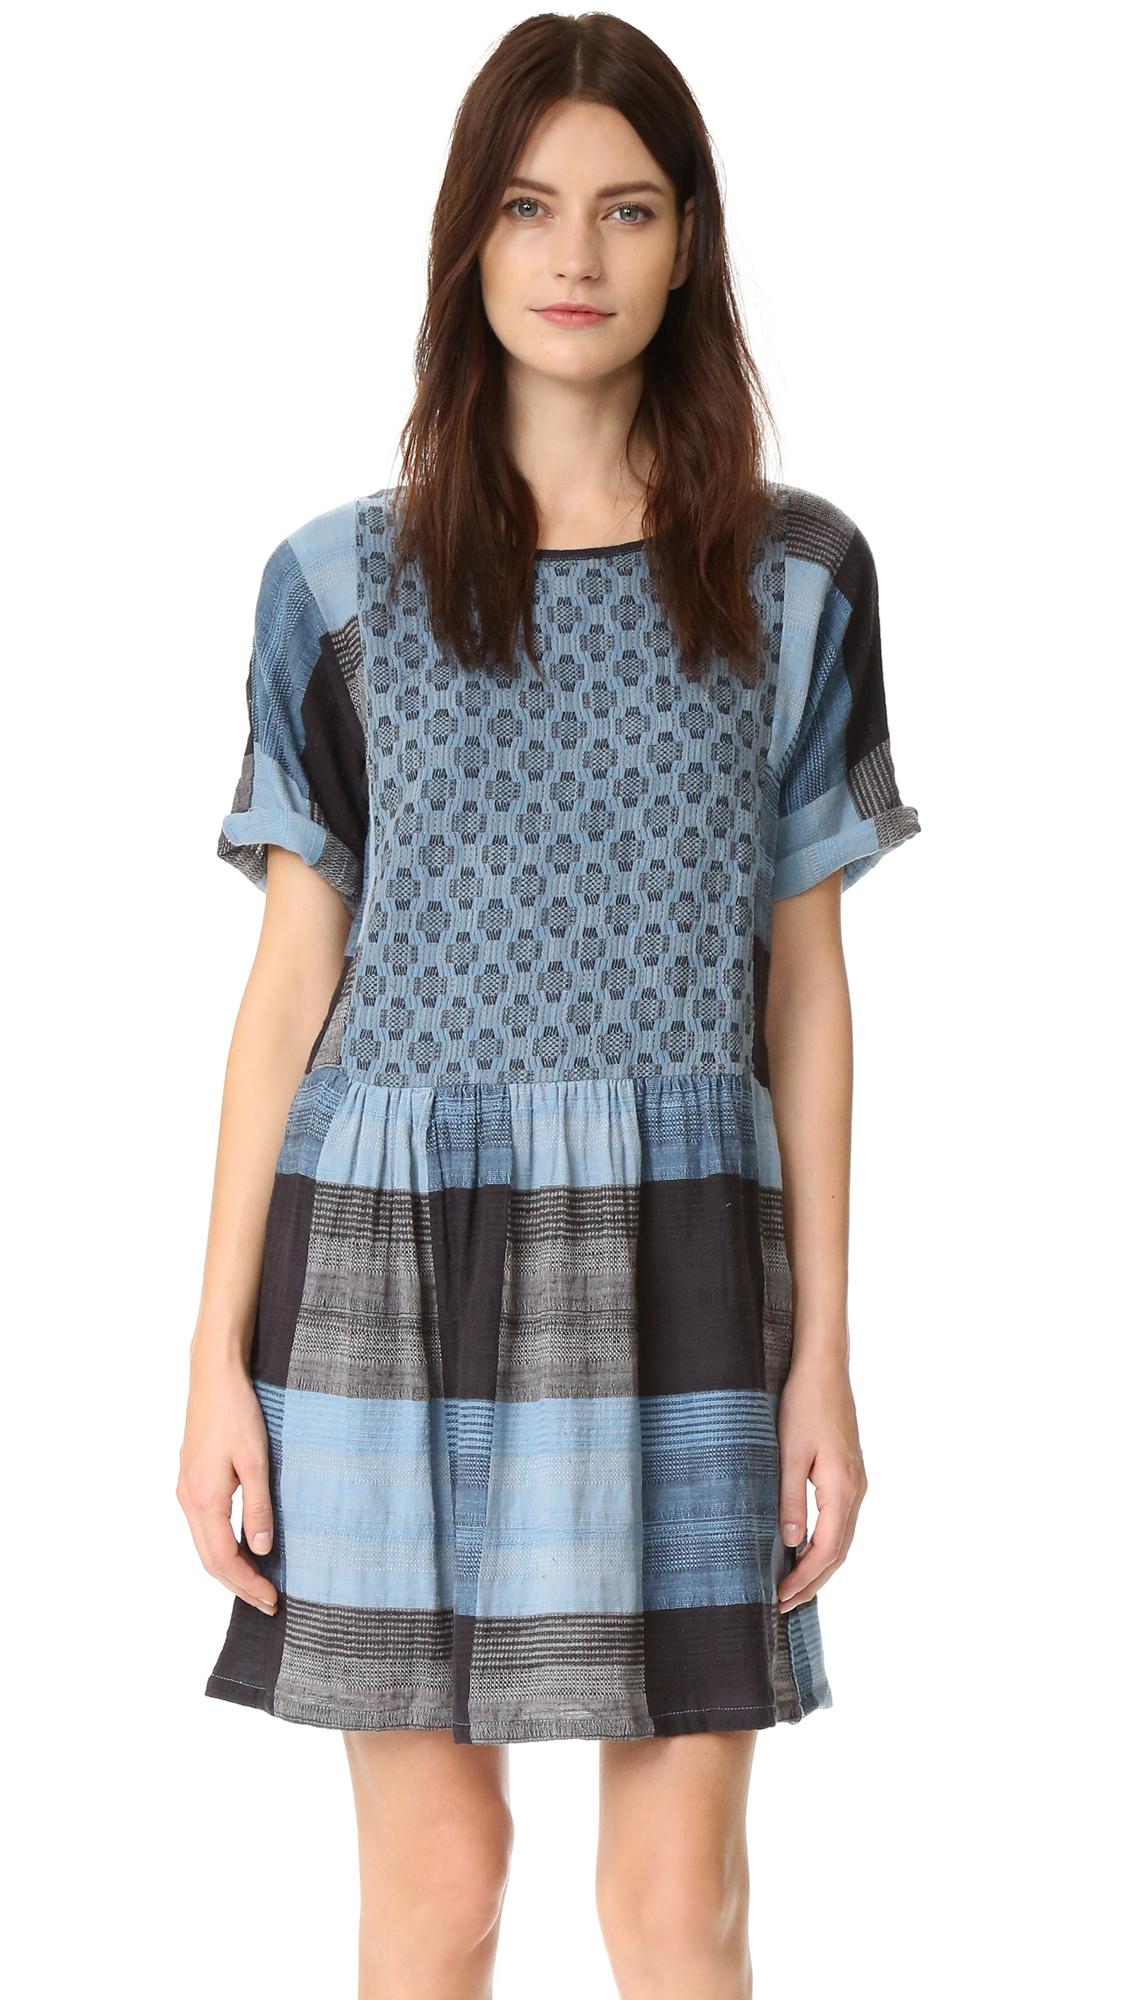 Ace&Jig Mini Cora Dress - Carolina/Victoria at Shopbop